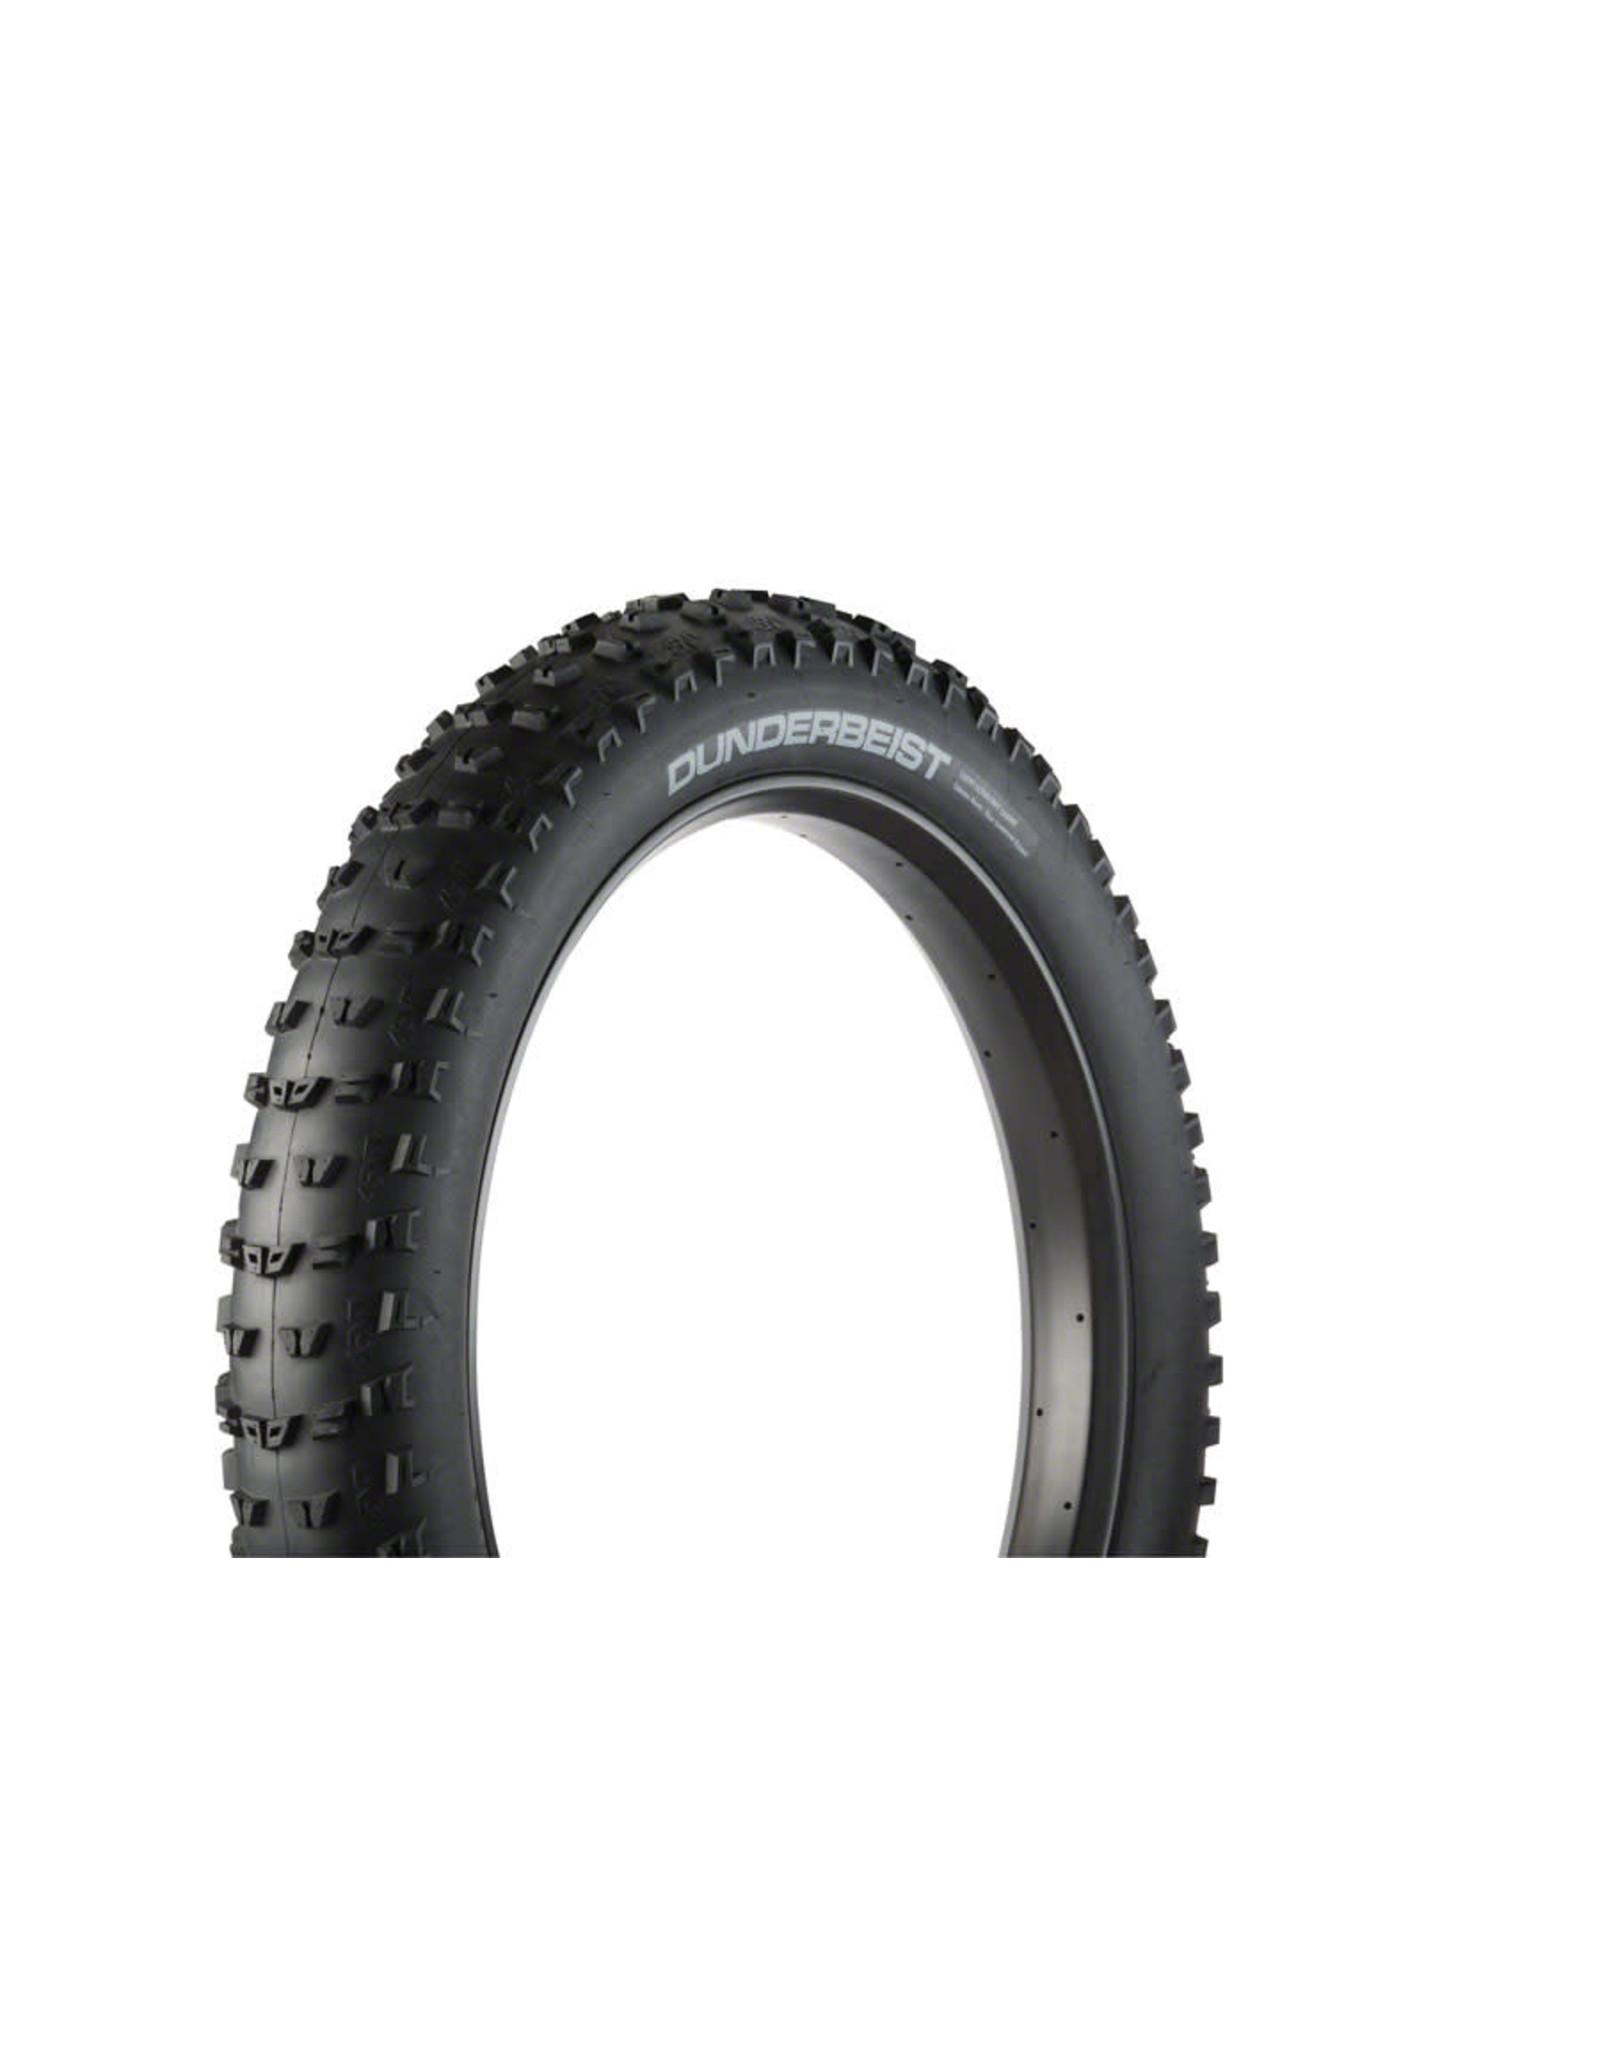 "45NRTH 45NRTH Dunderbeist 26x4.6"" Fatbike Tire 120tpi Tubeless Folding"